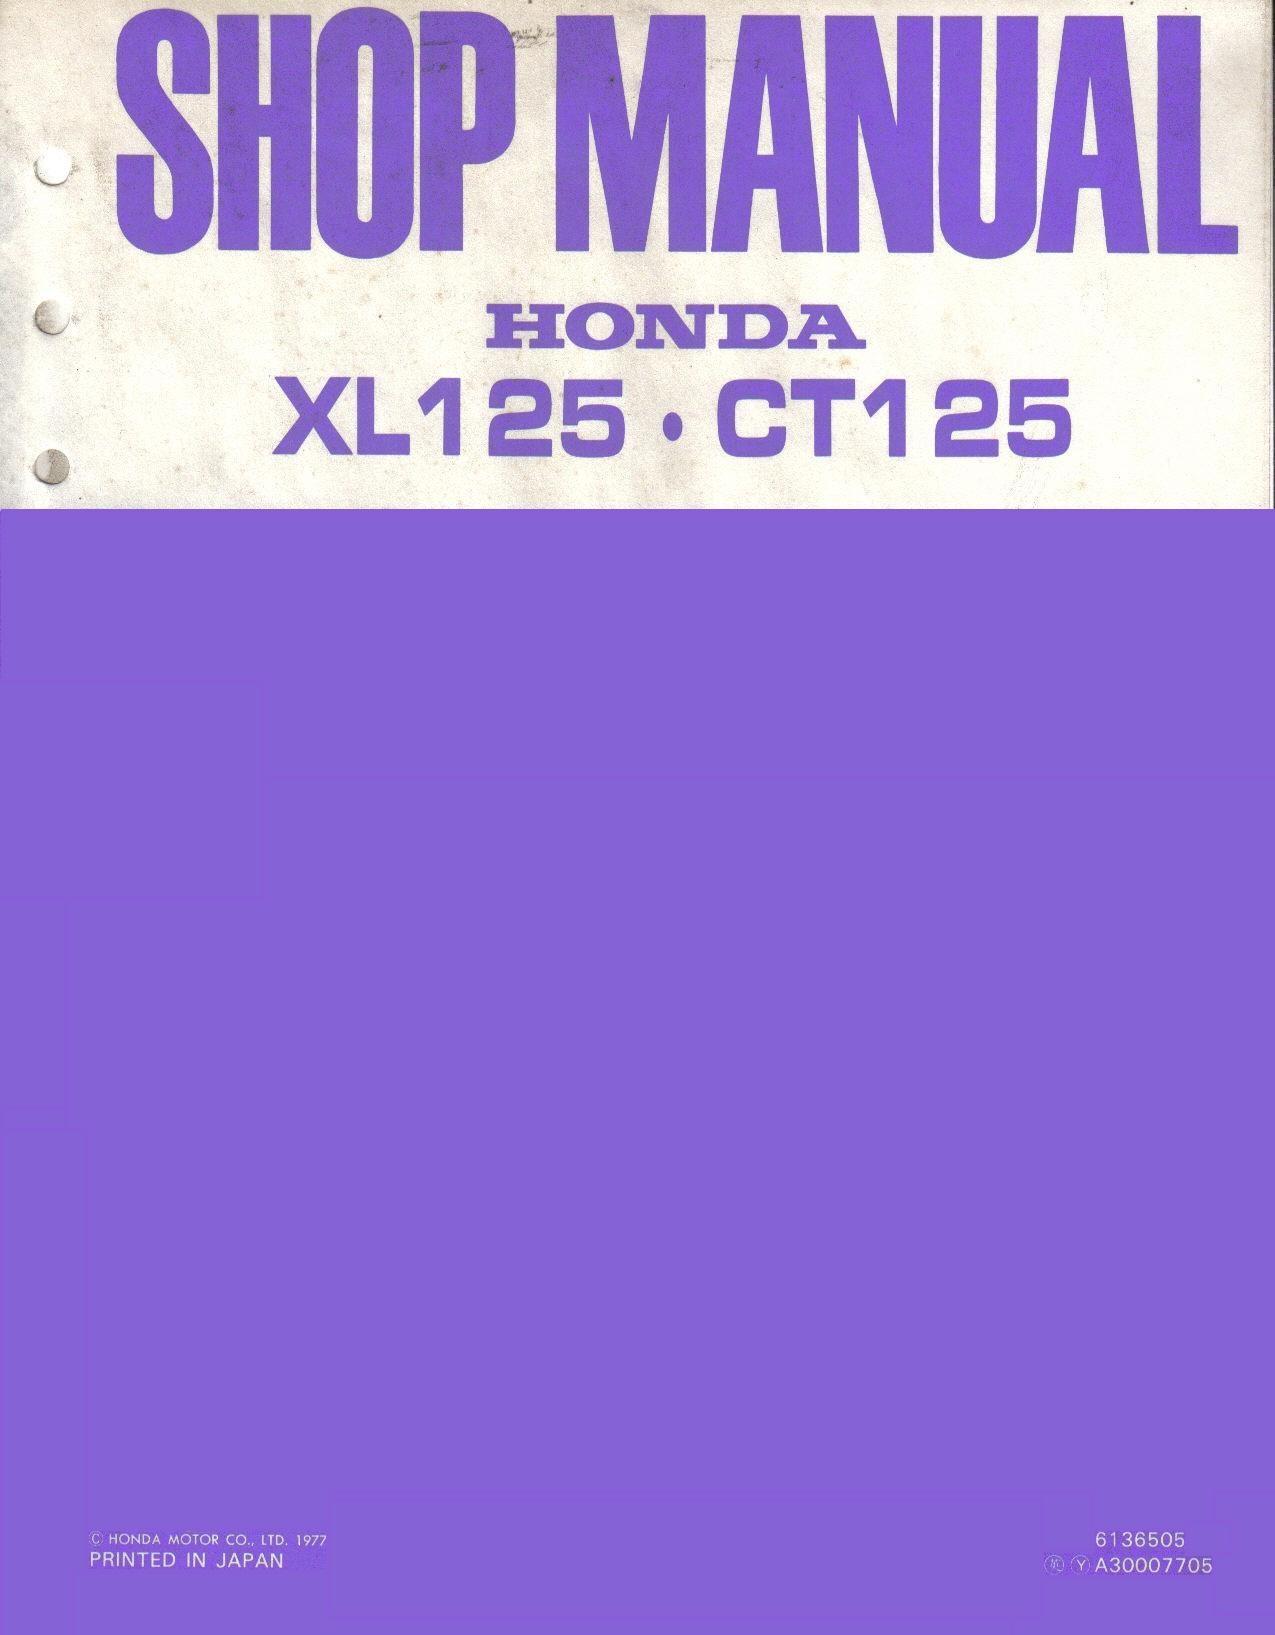 Workshop manual for Honda XT125 (1976-1977)